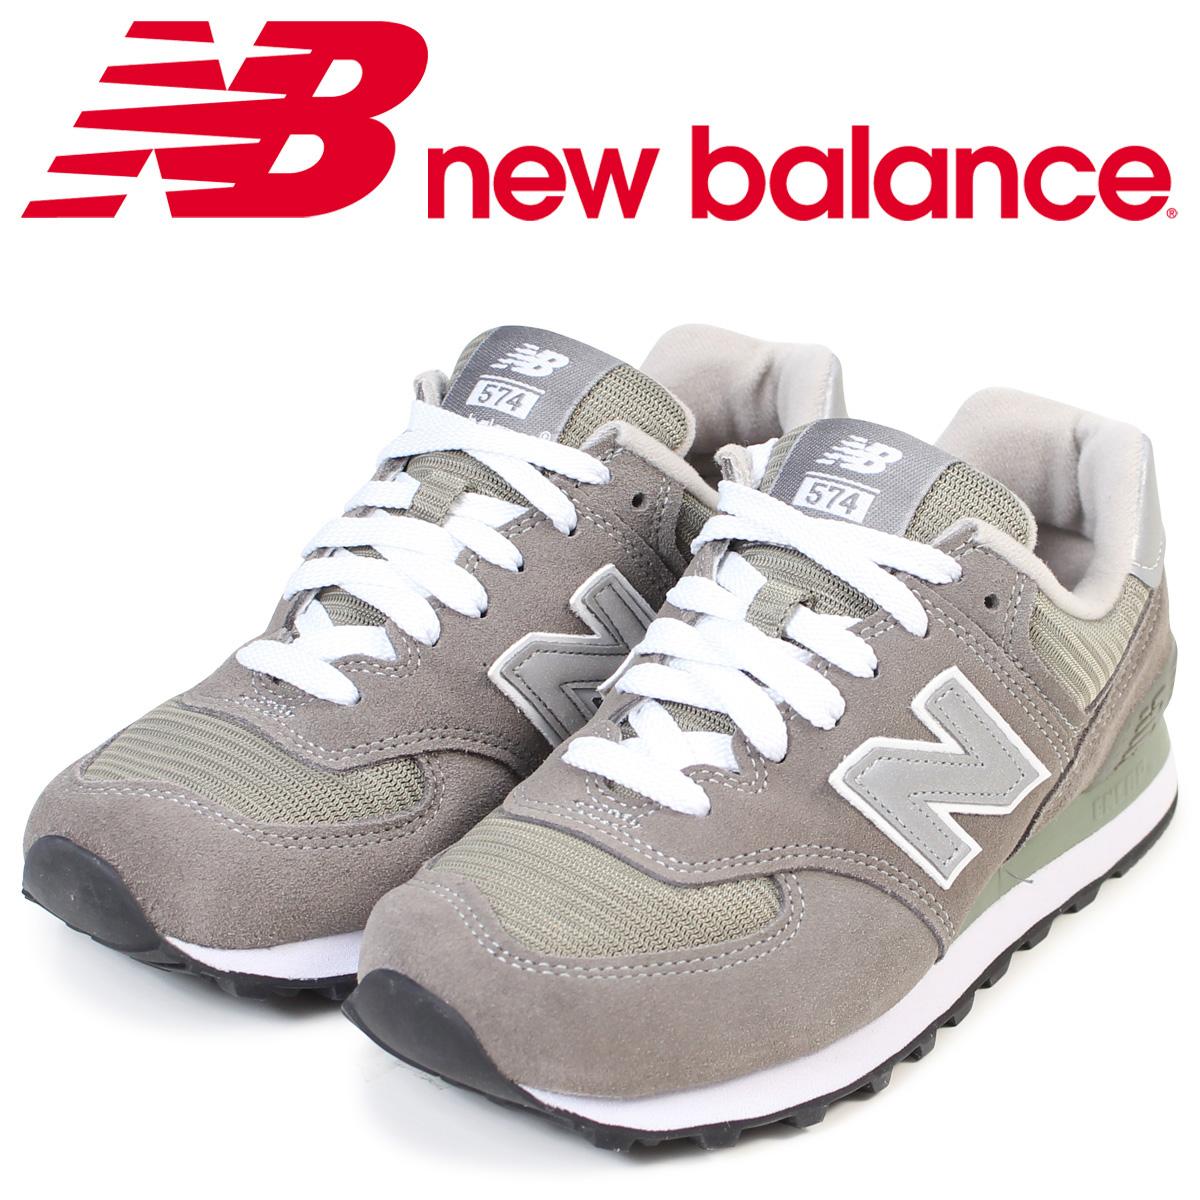 new balance 574 fsc